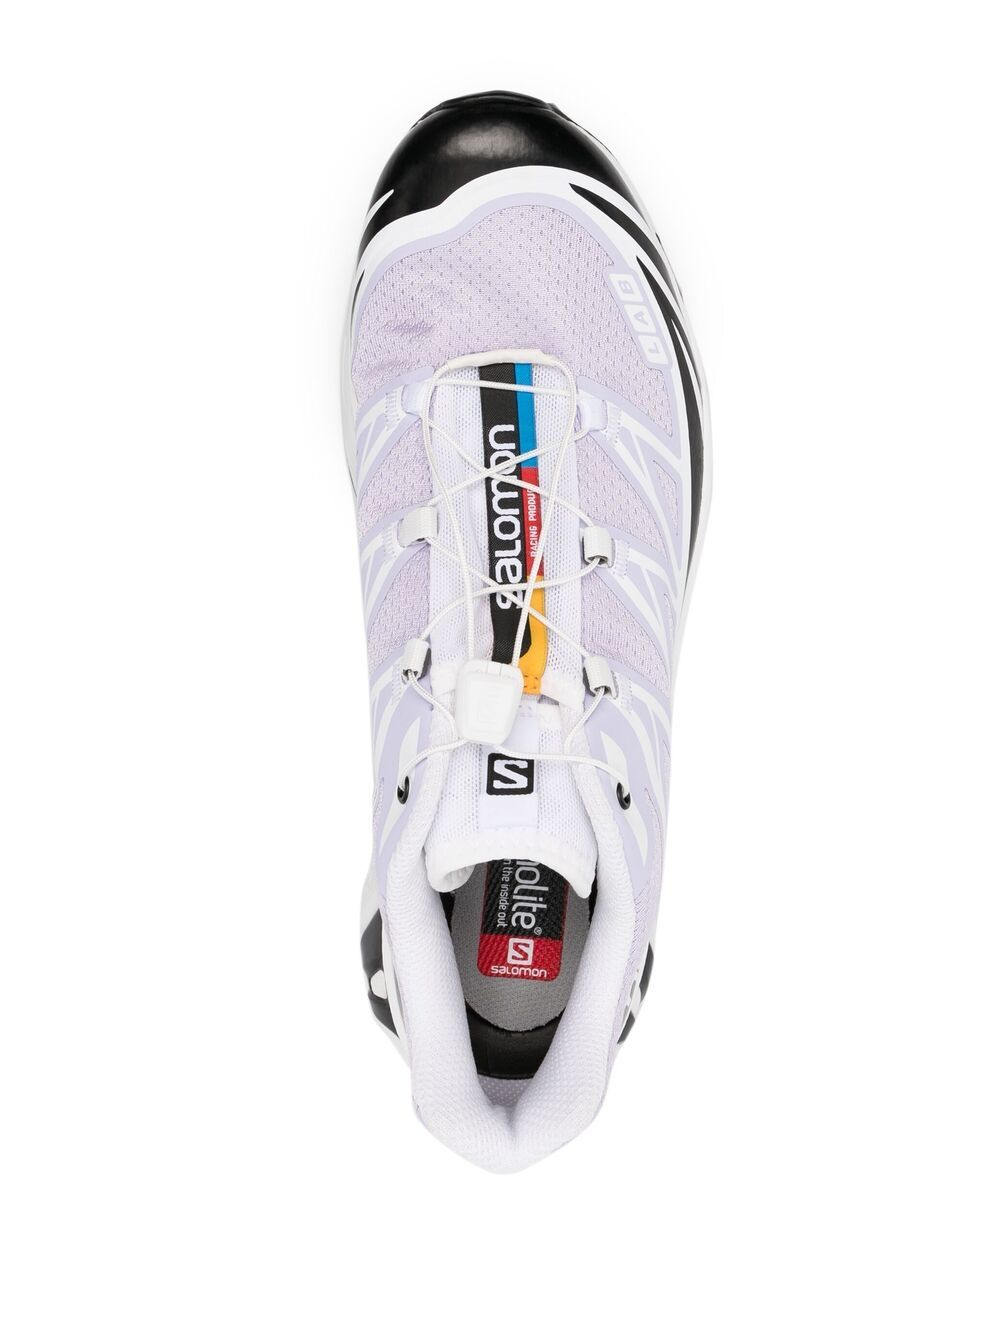 Salomon S/Lab sneakers xt-6 uomo bianco SALOMON S/LAB | Sneakers | L41317200